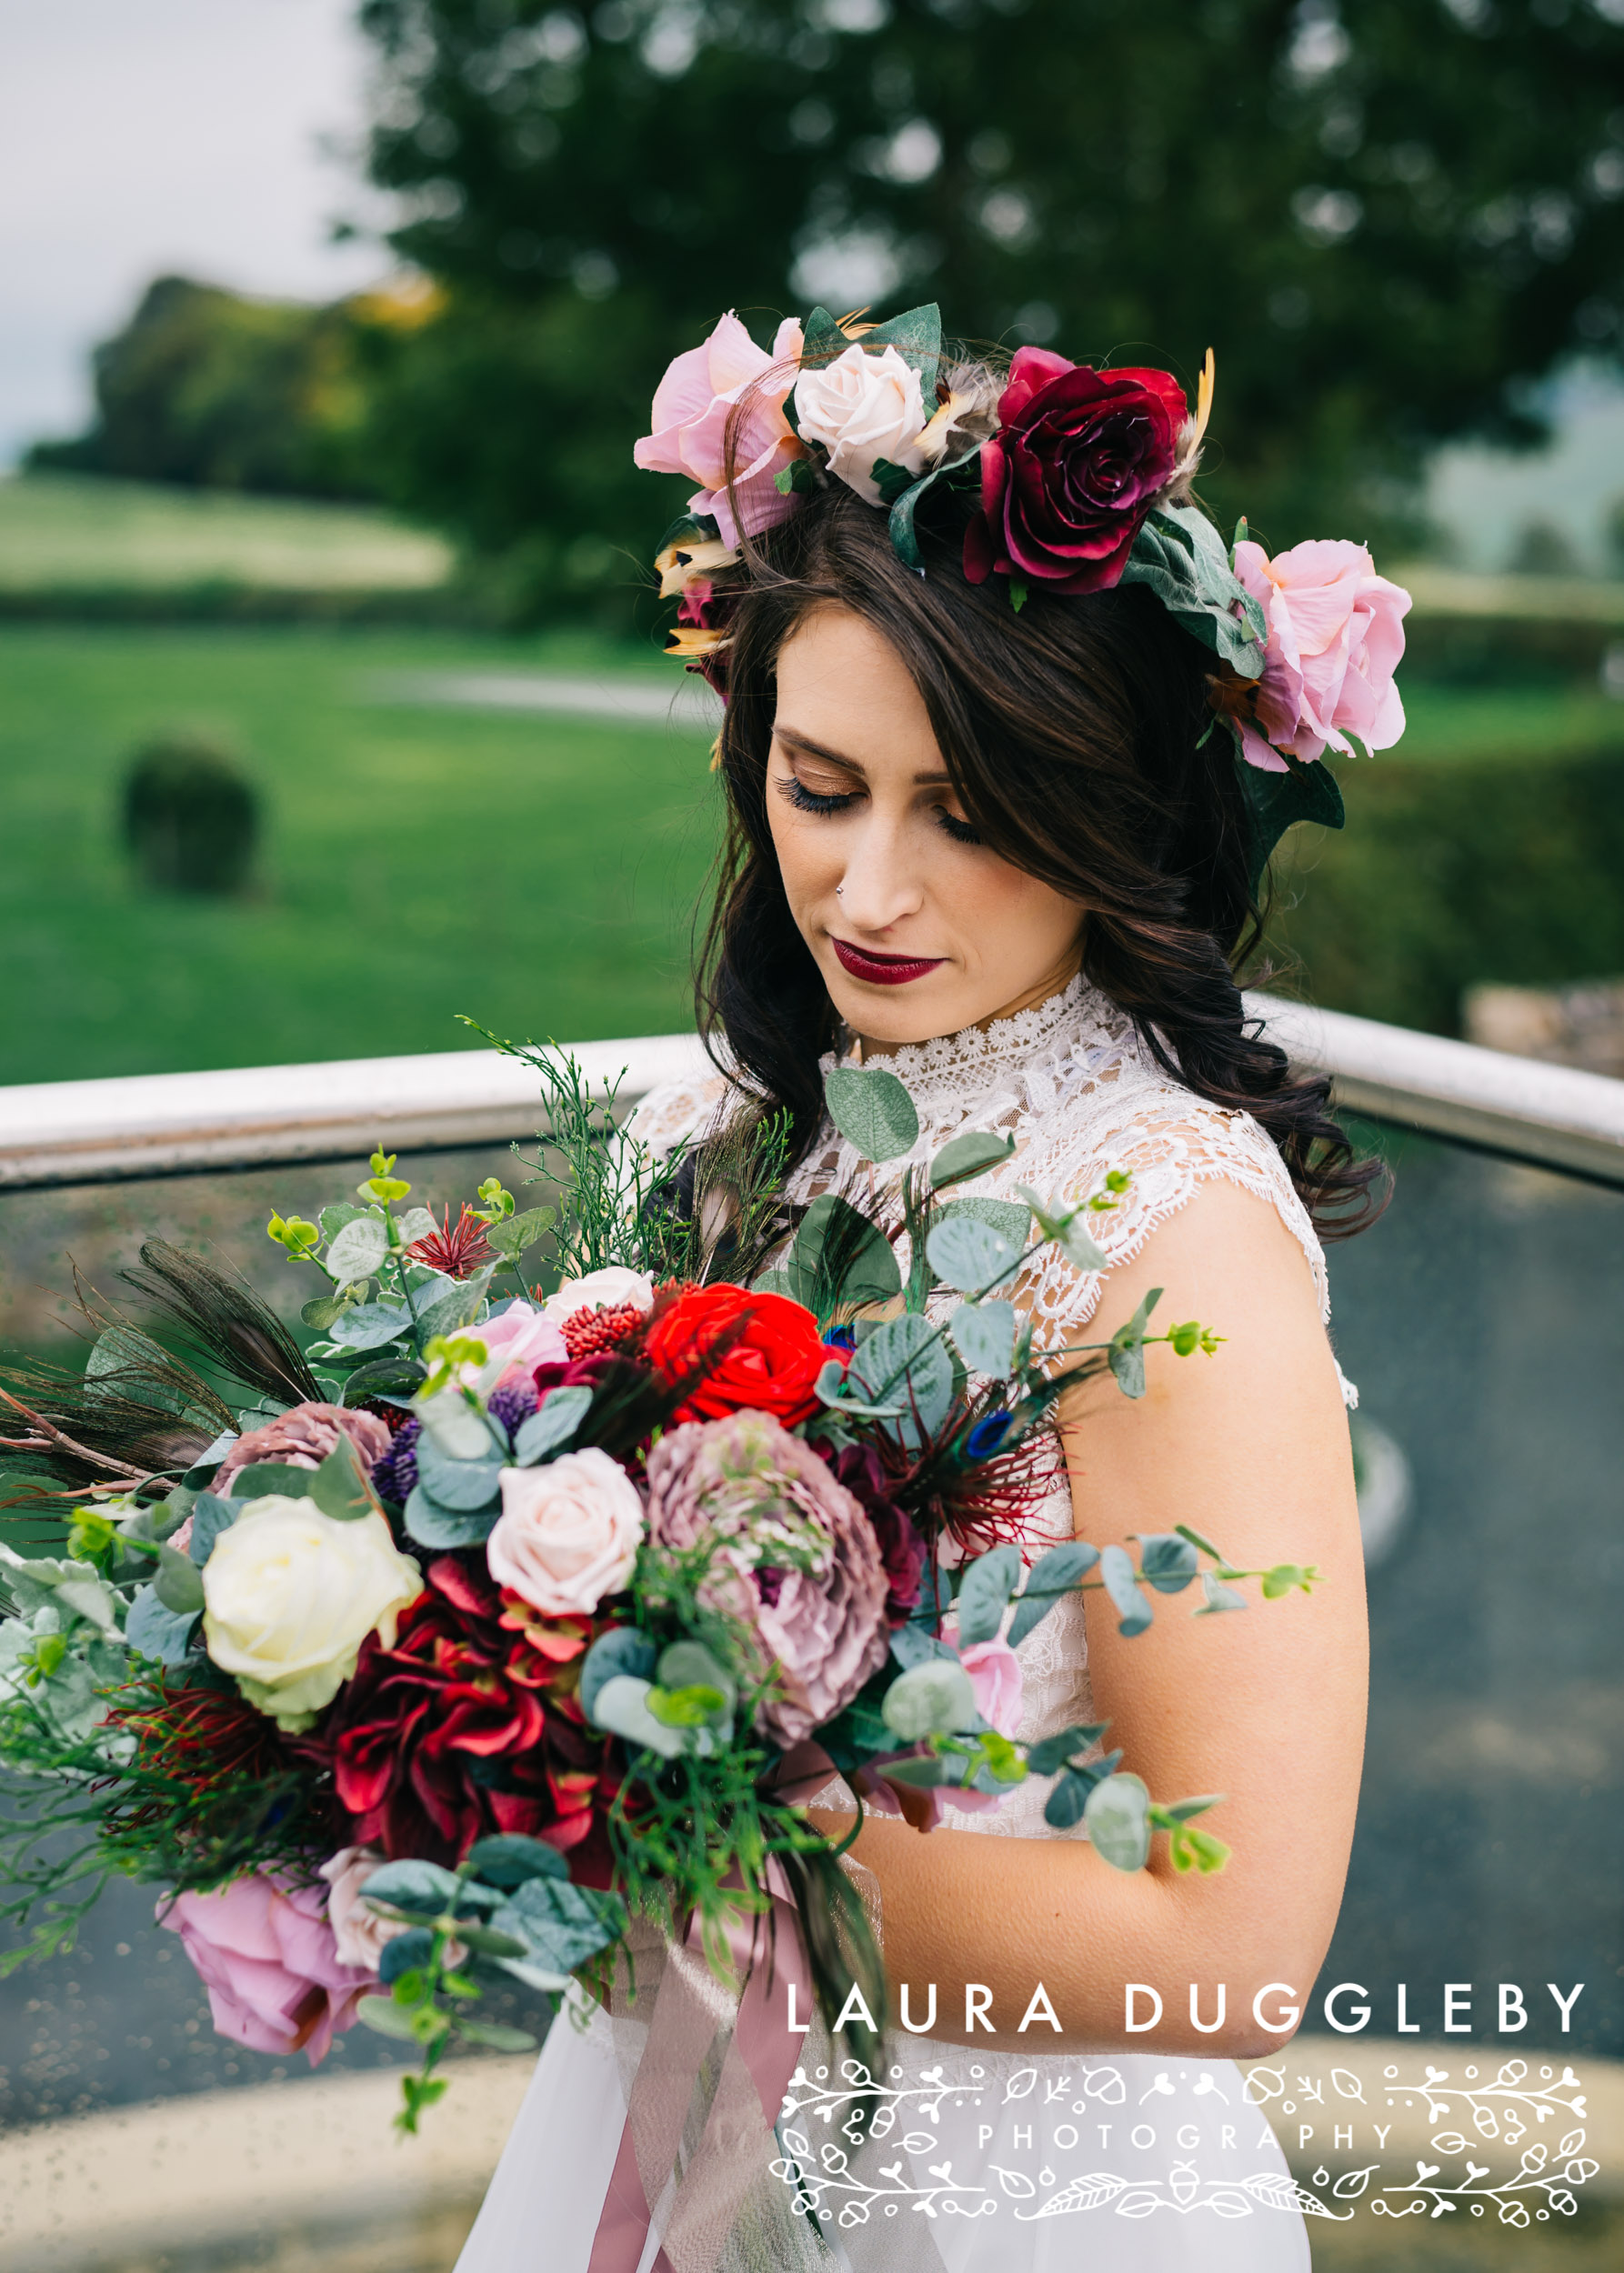 Thornton Hall Country Park - Wedding Photographer14